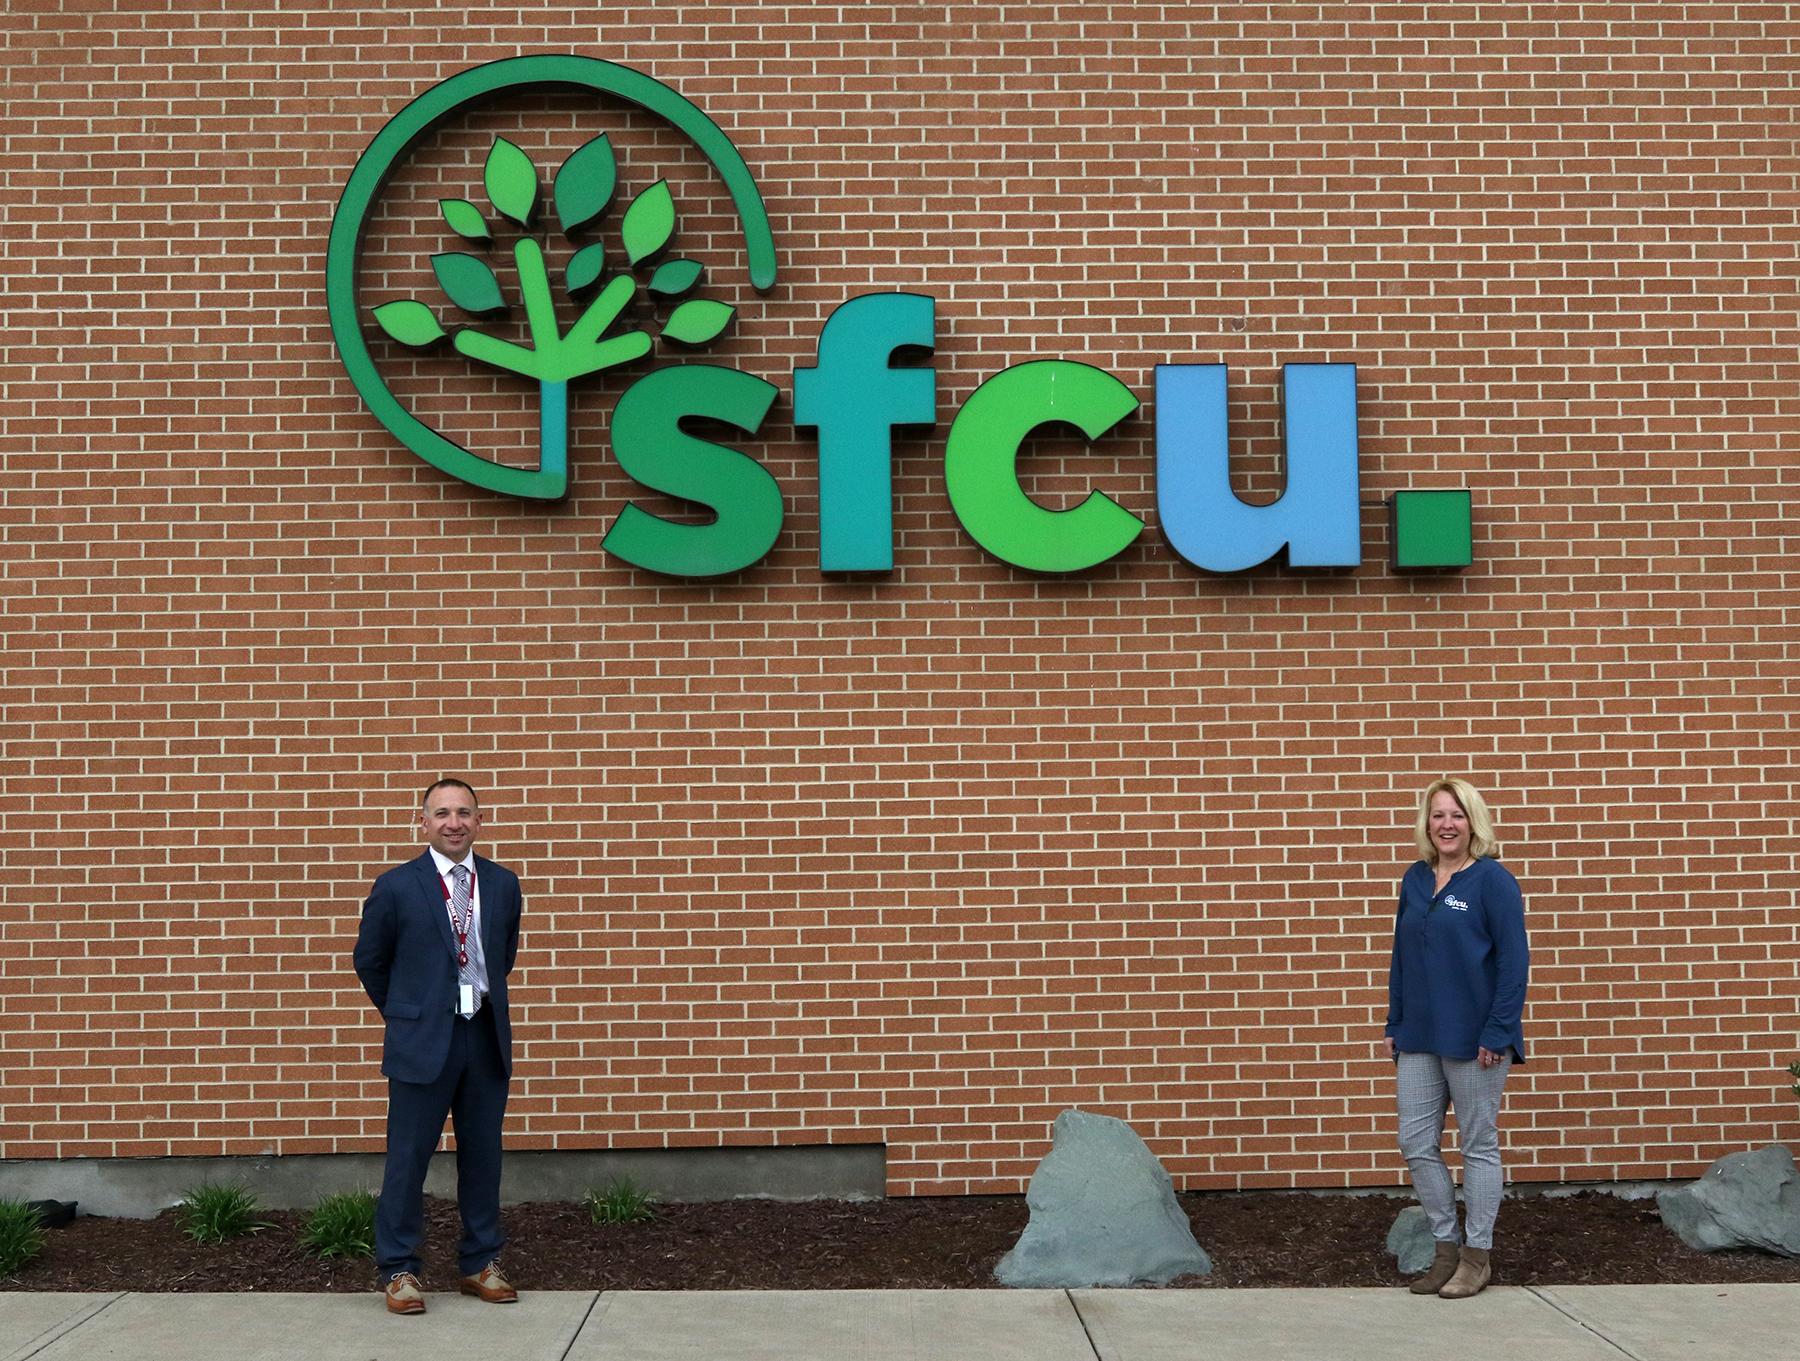 SFCU and Sidney partnership